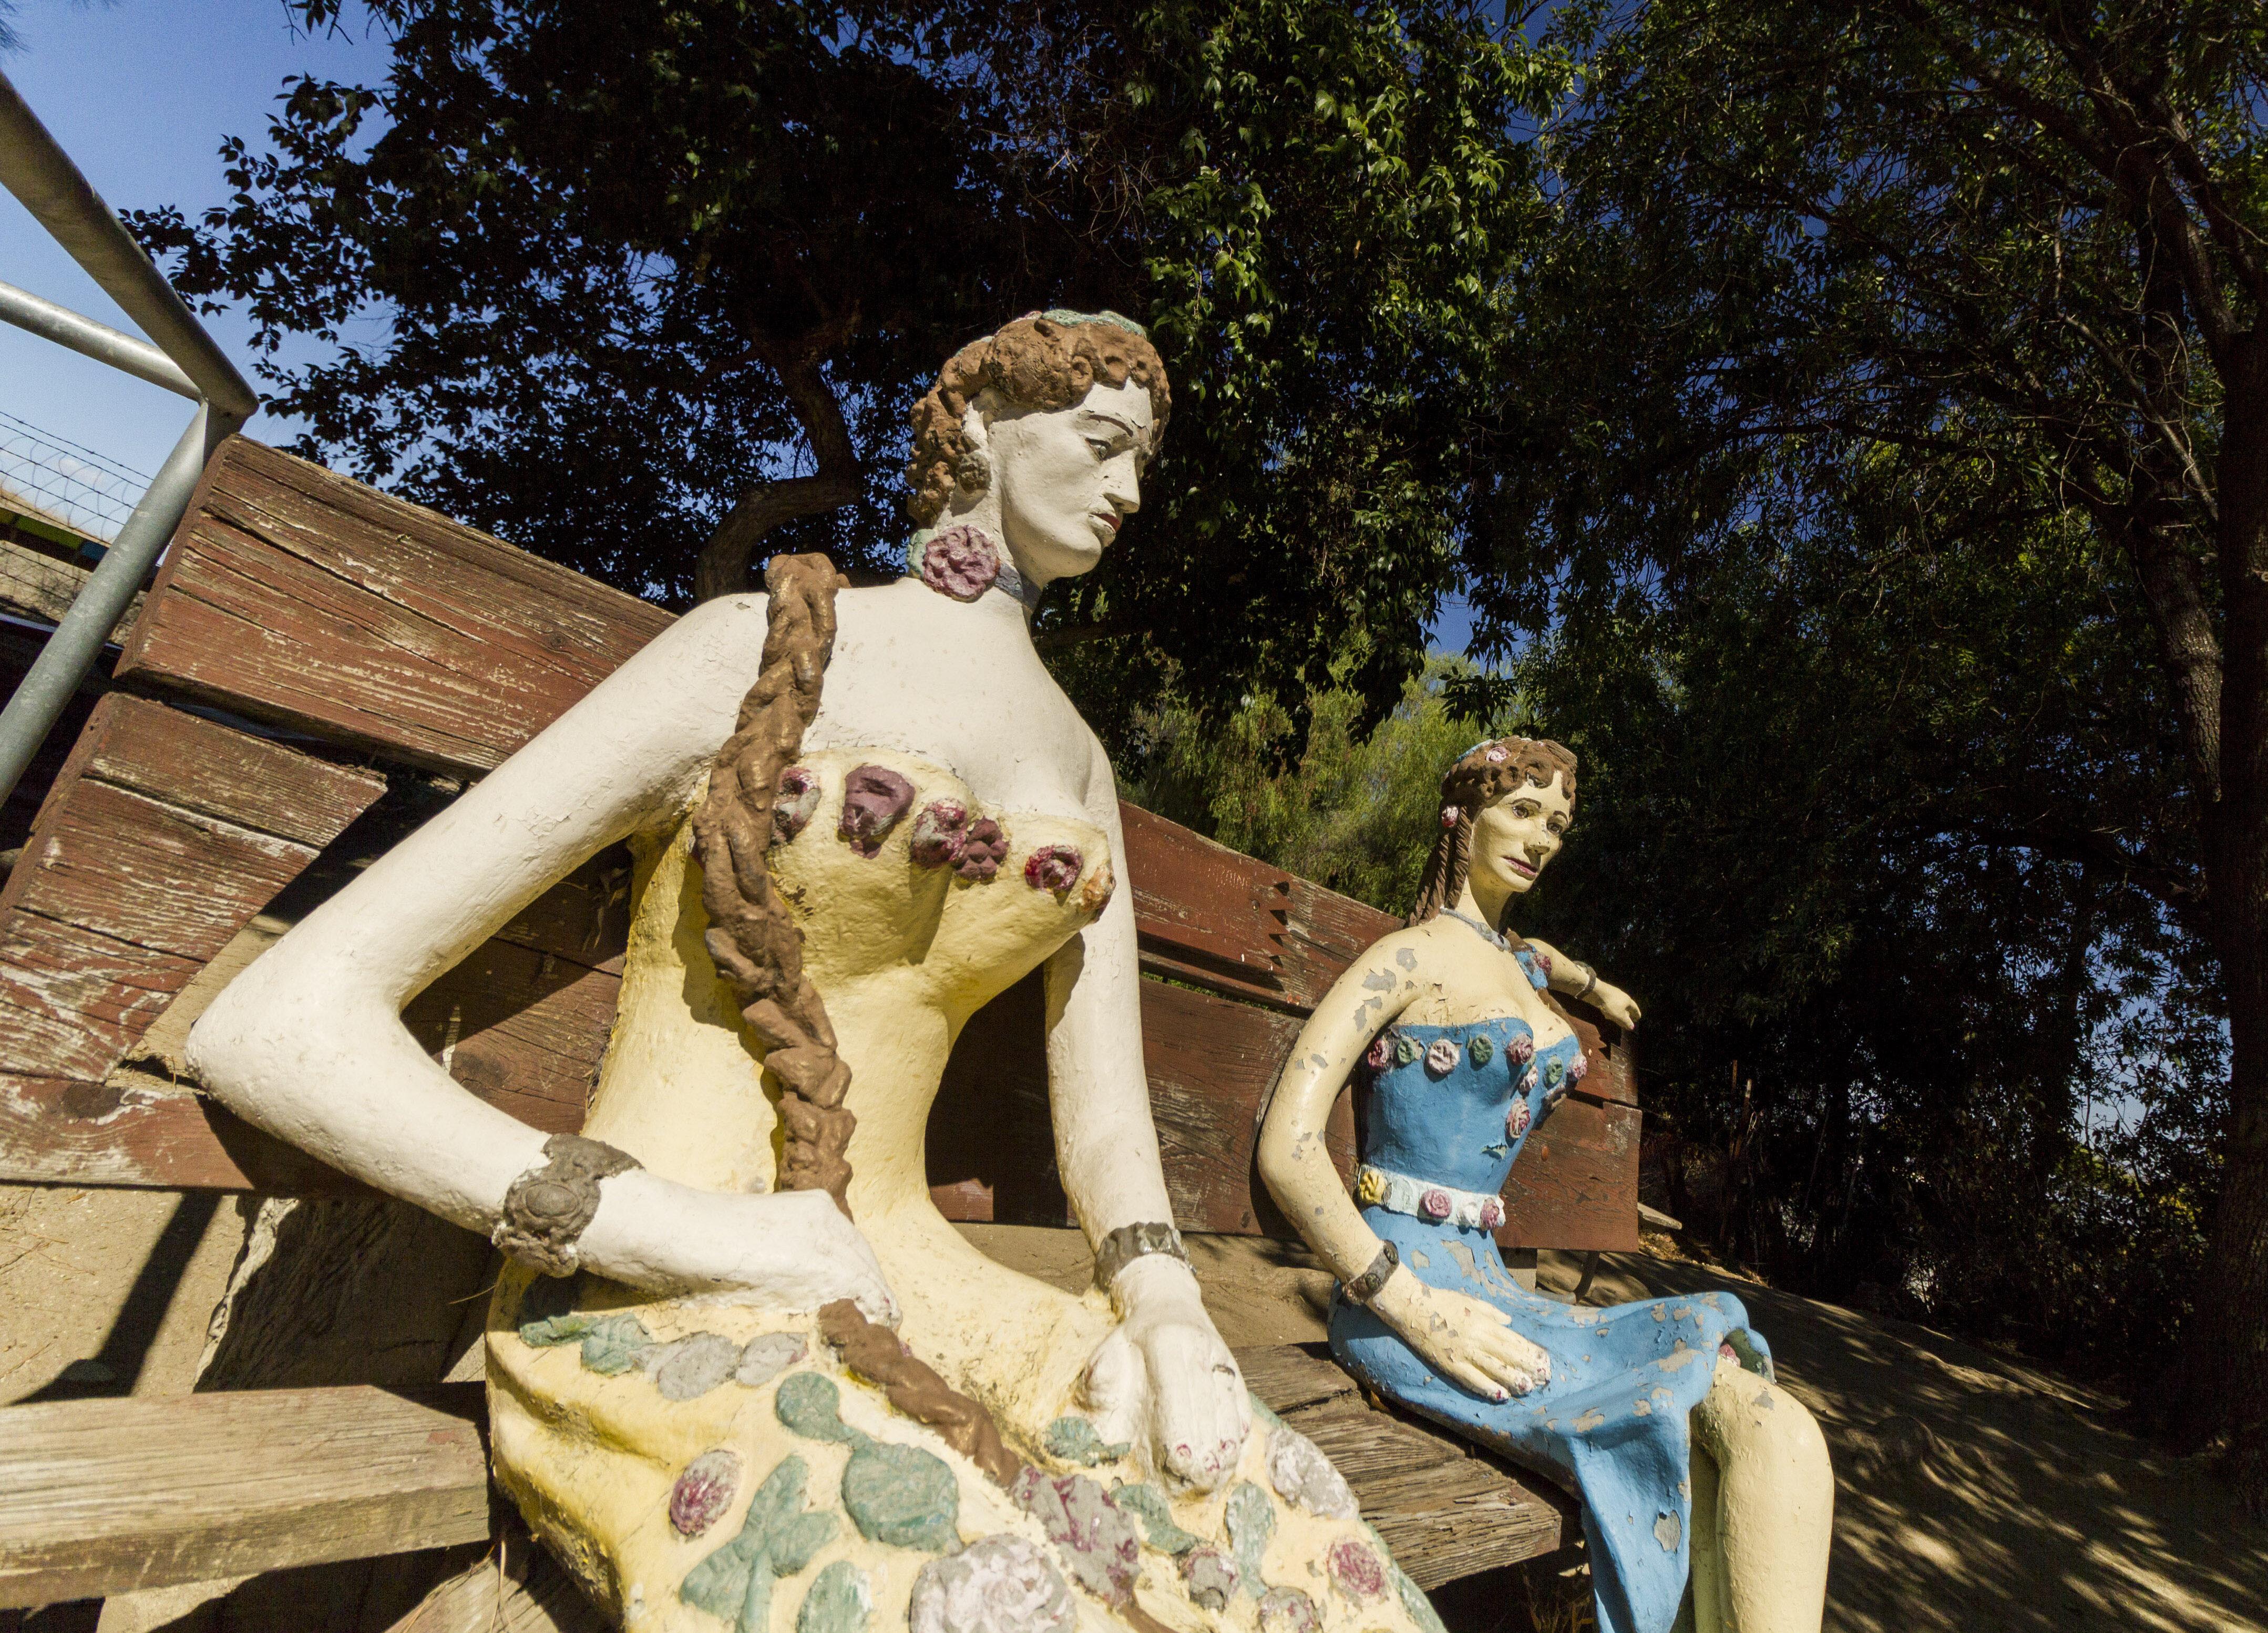 Column: Racist statues still on campus